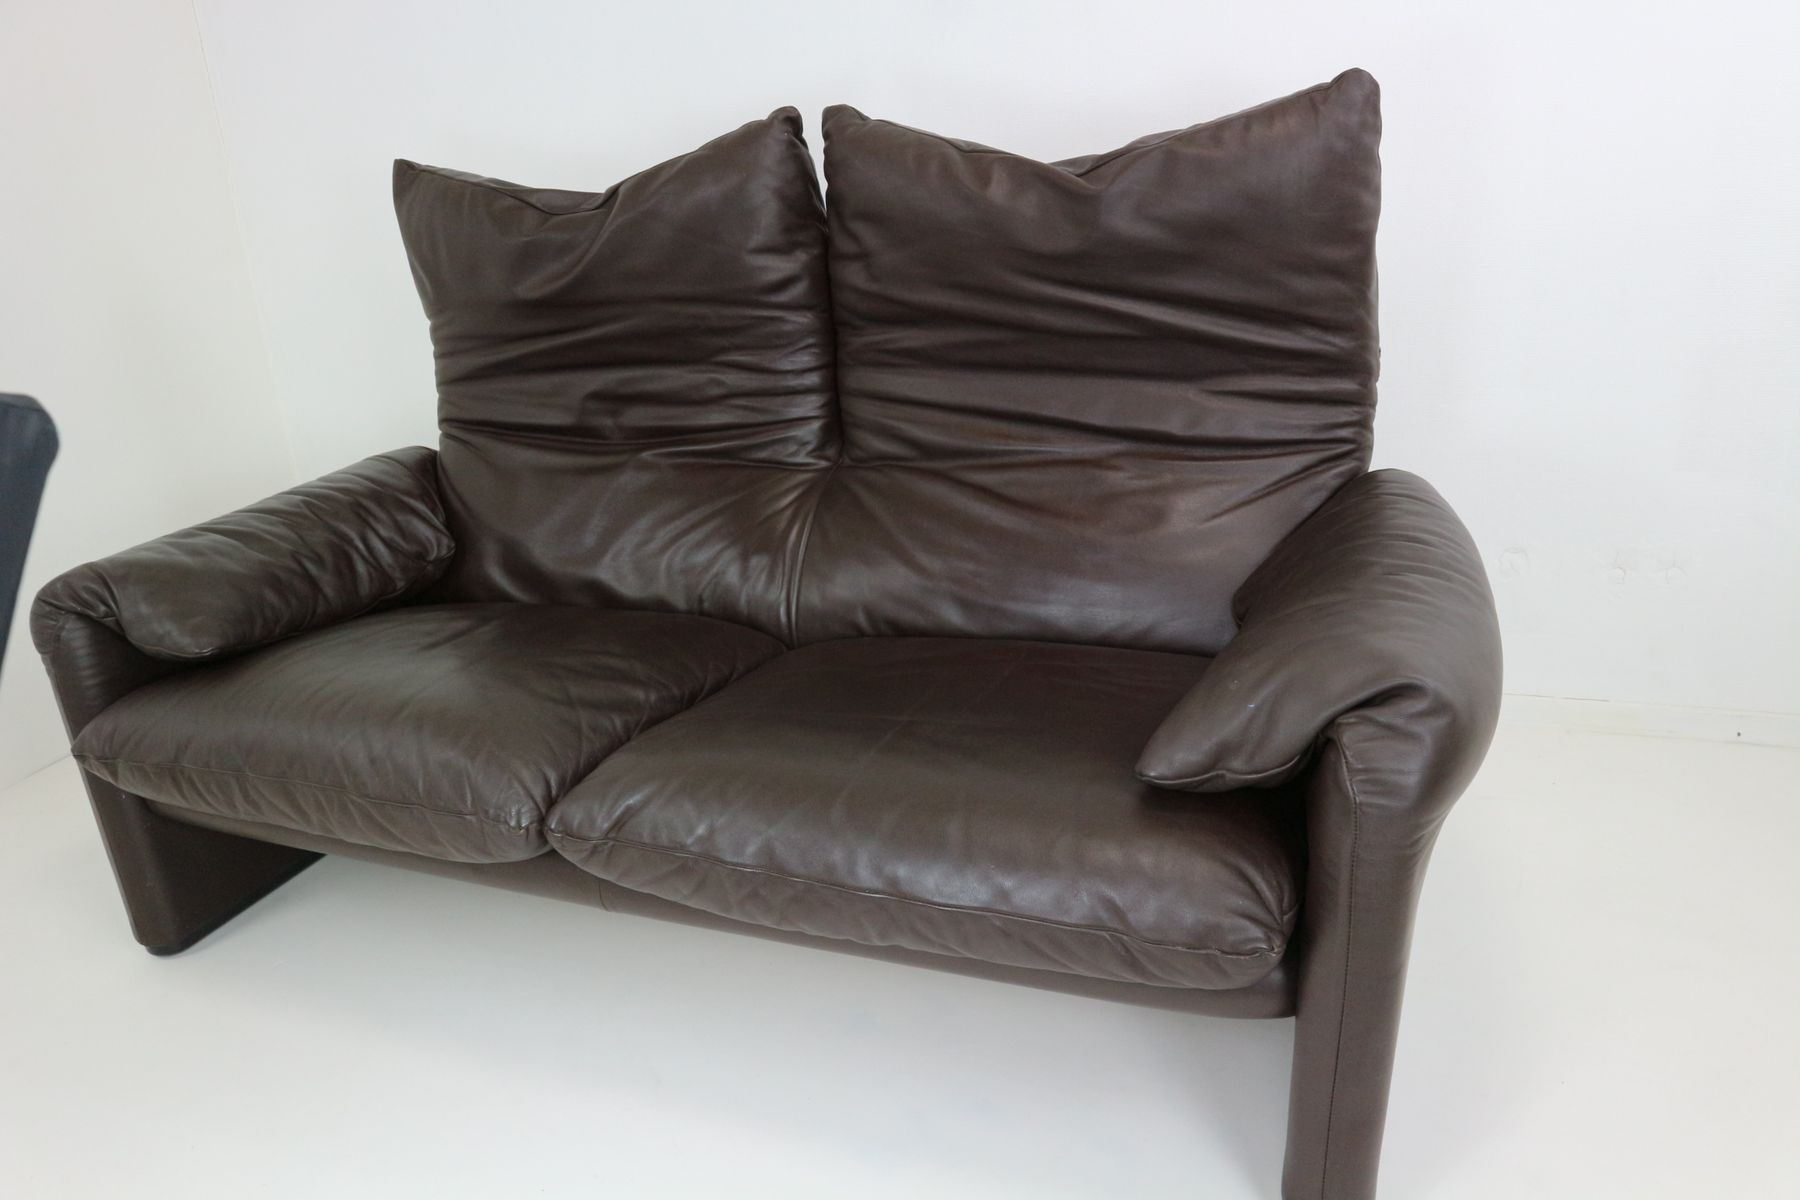 vintage leder zwei sitzer maralunga sofa von vico magistretti f r cassina bei pamono kaufen. Black Bedroom Furniture Sets. Home Design Ideas